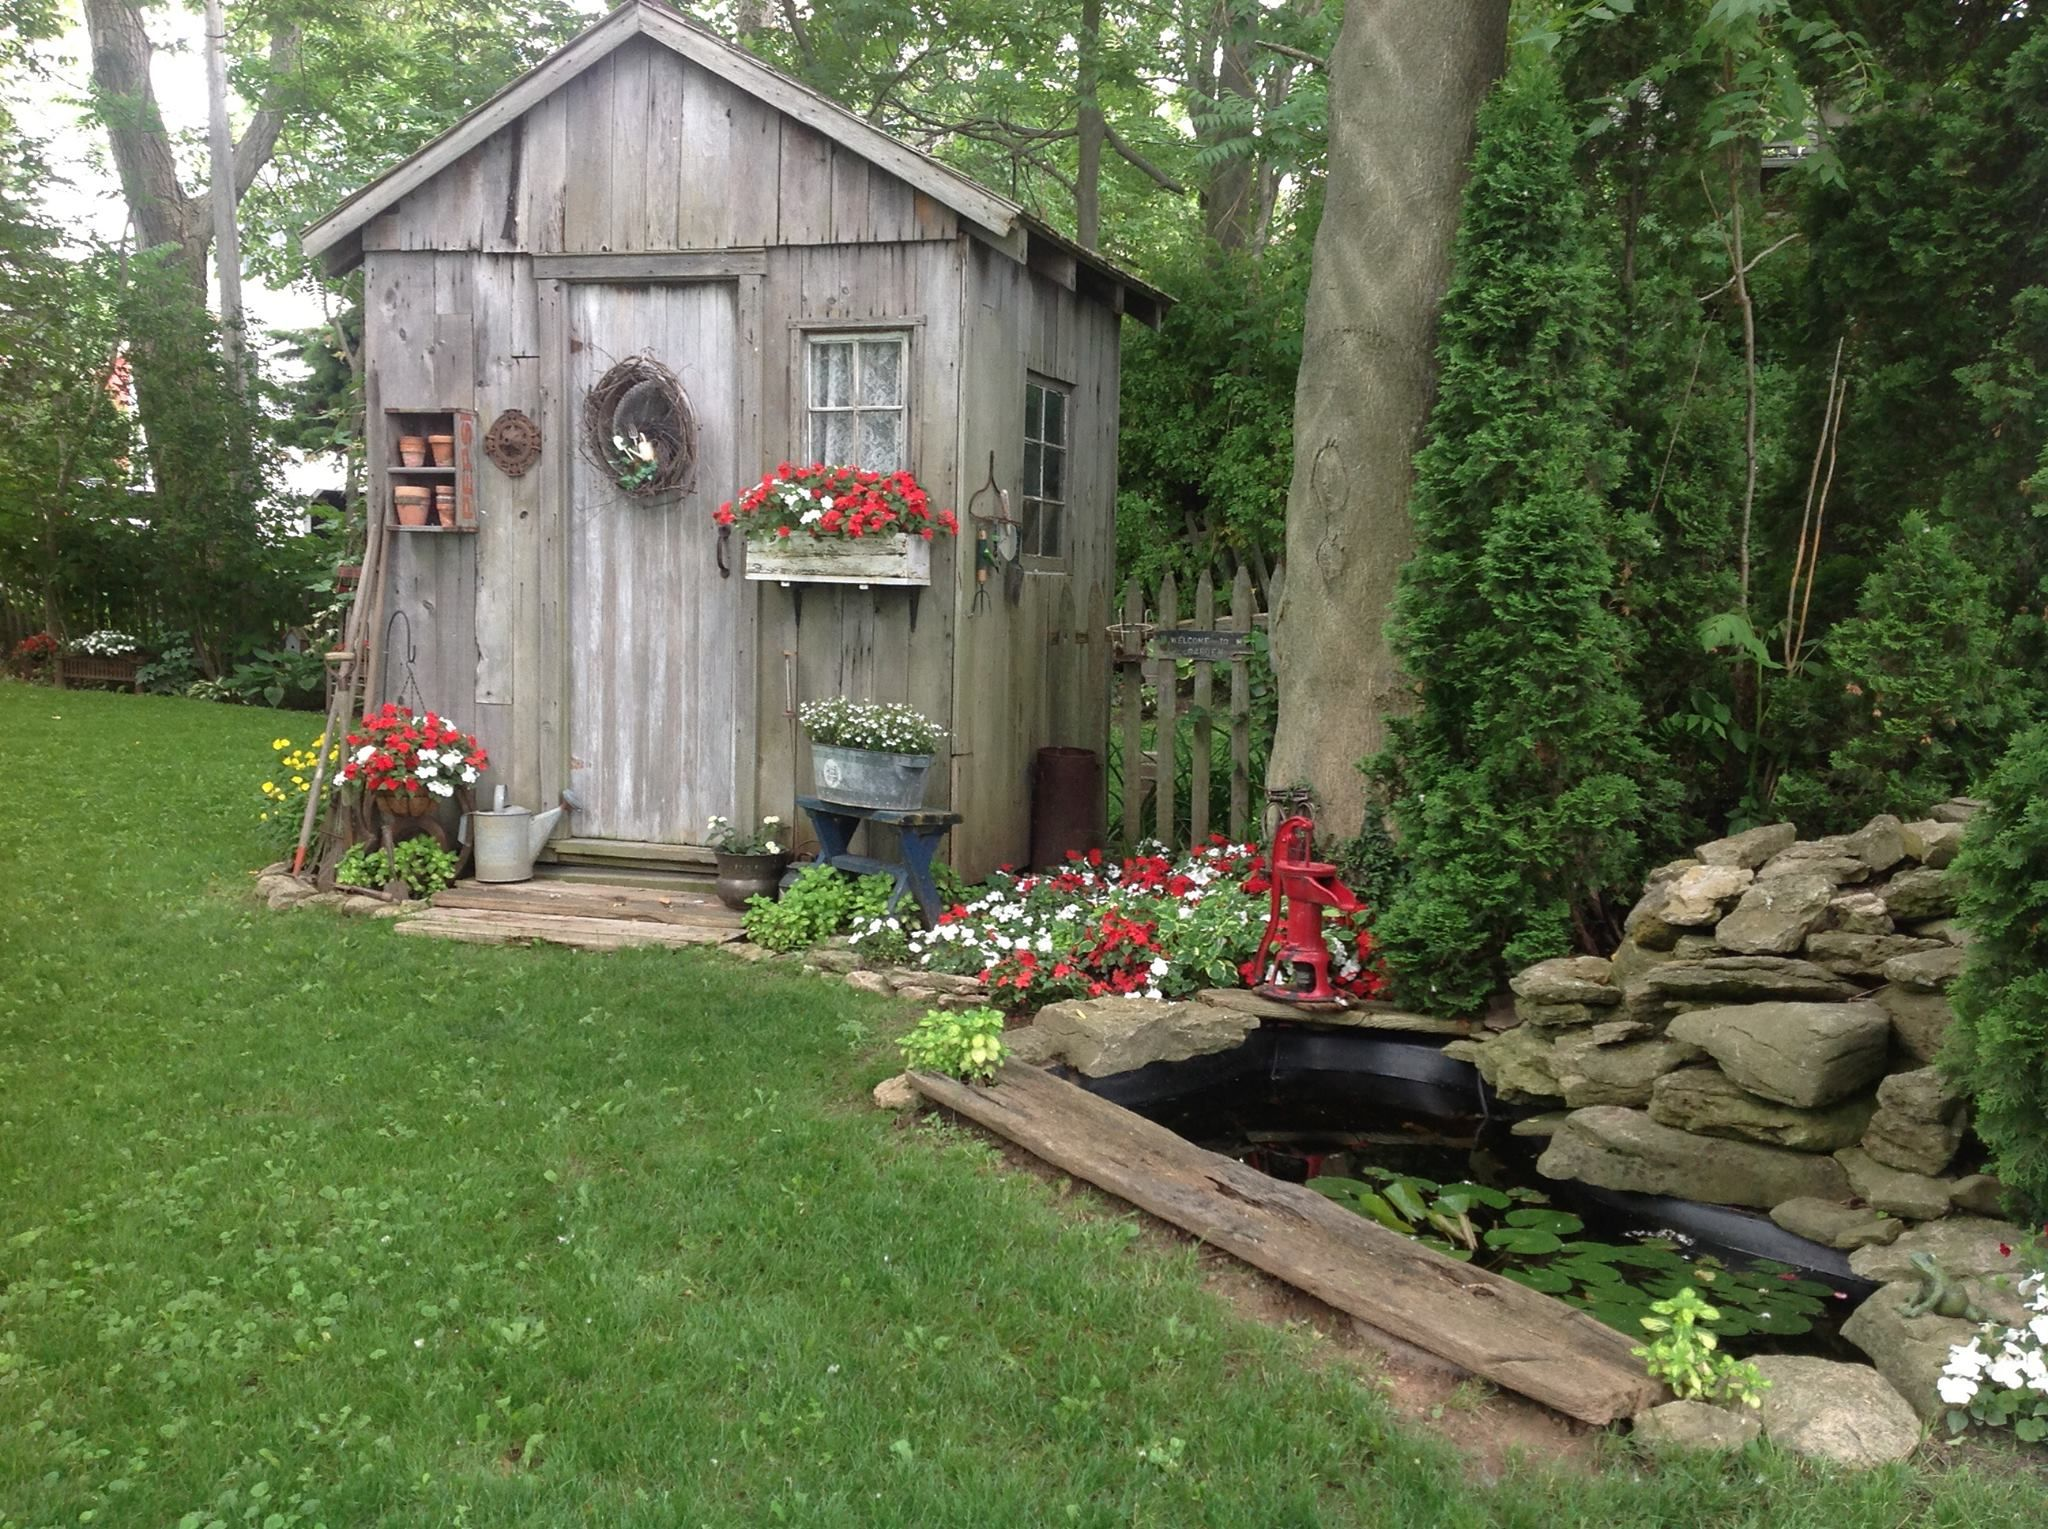 Fairytale Backyards: 30 Magical Garden Sheds | Gardens, Backyard and ...